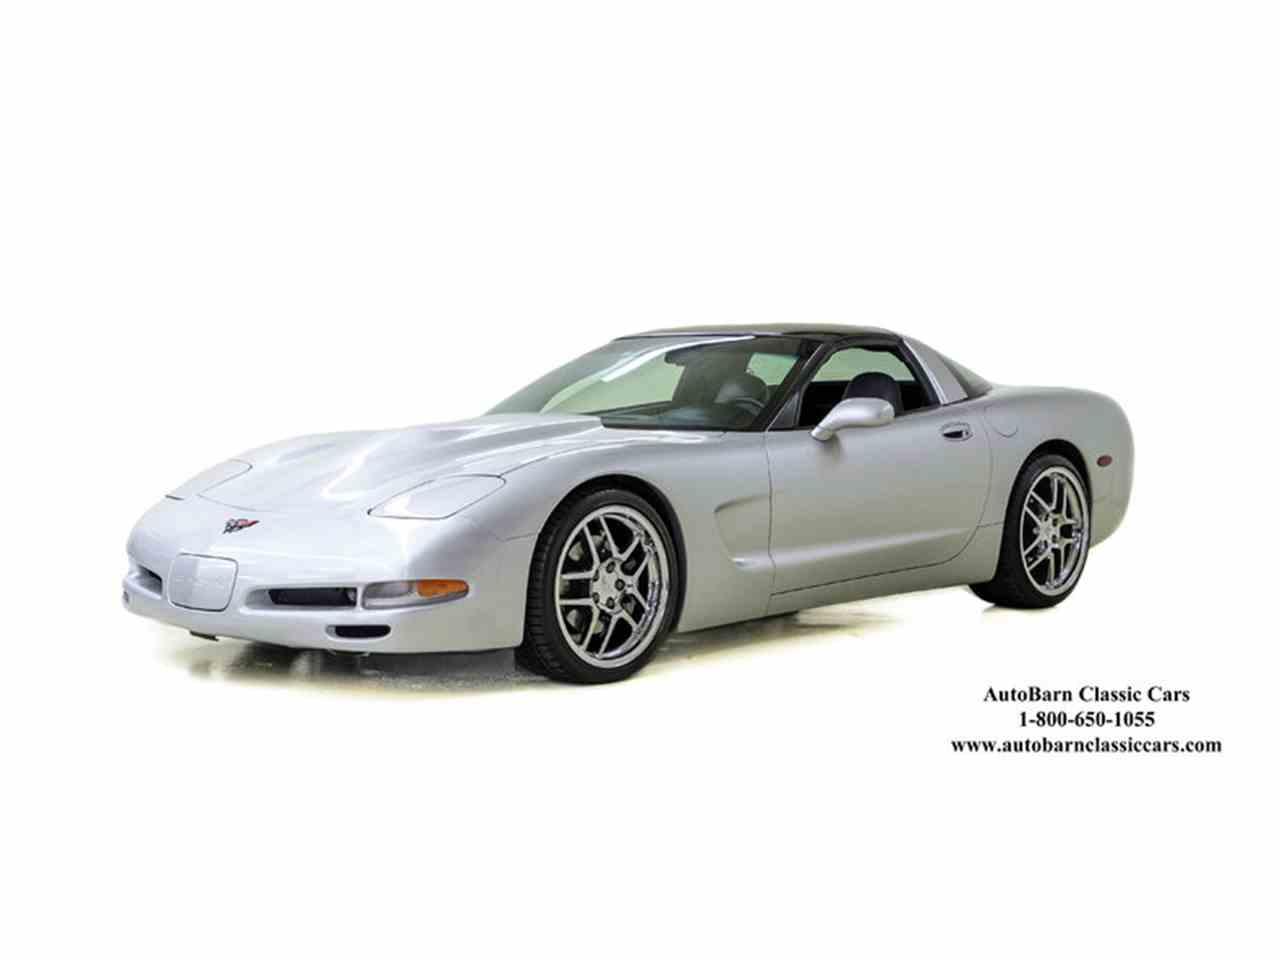 1999 Chevrolet Corvette for Sale - CC-987258